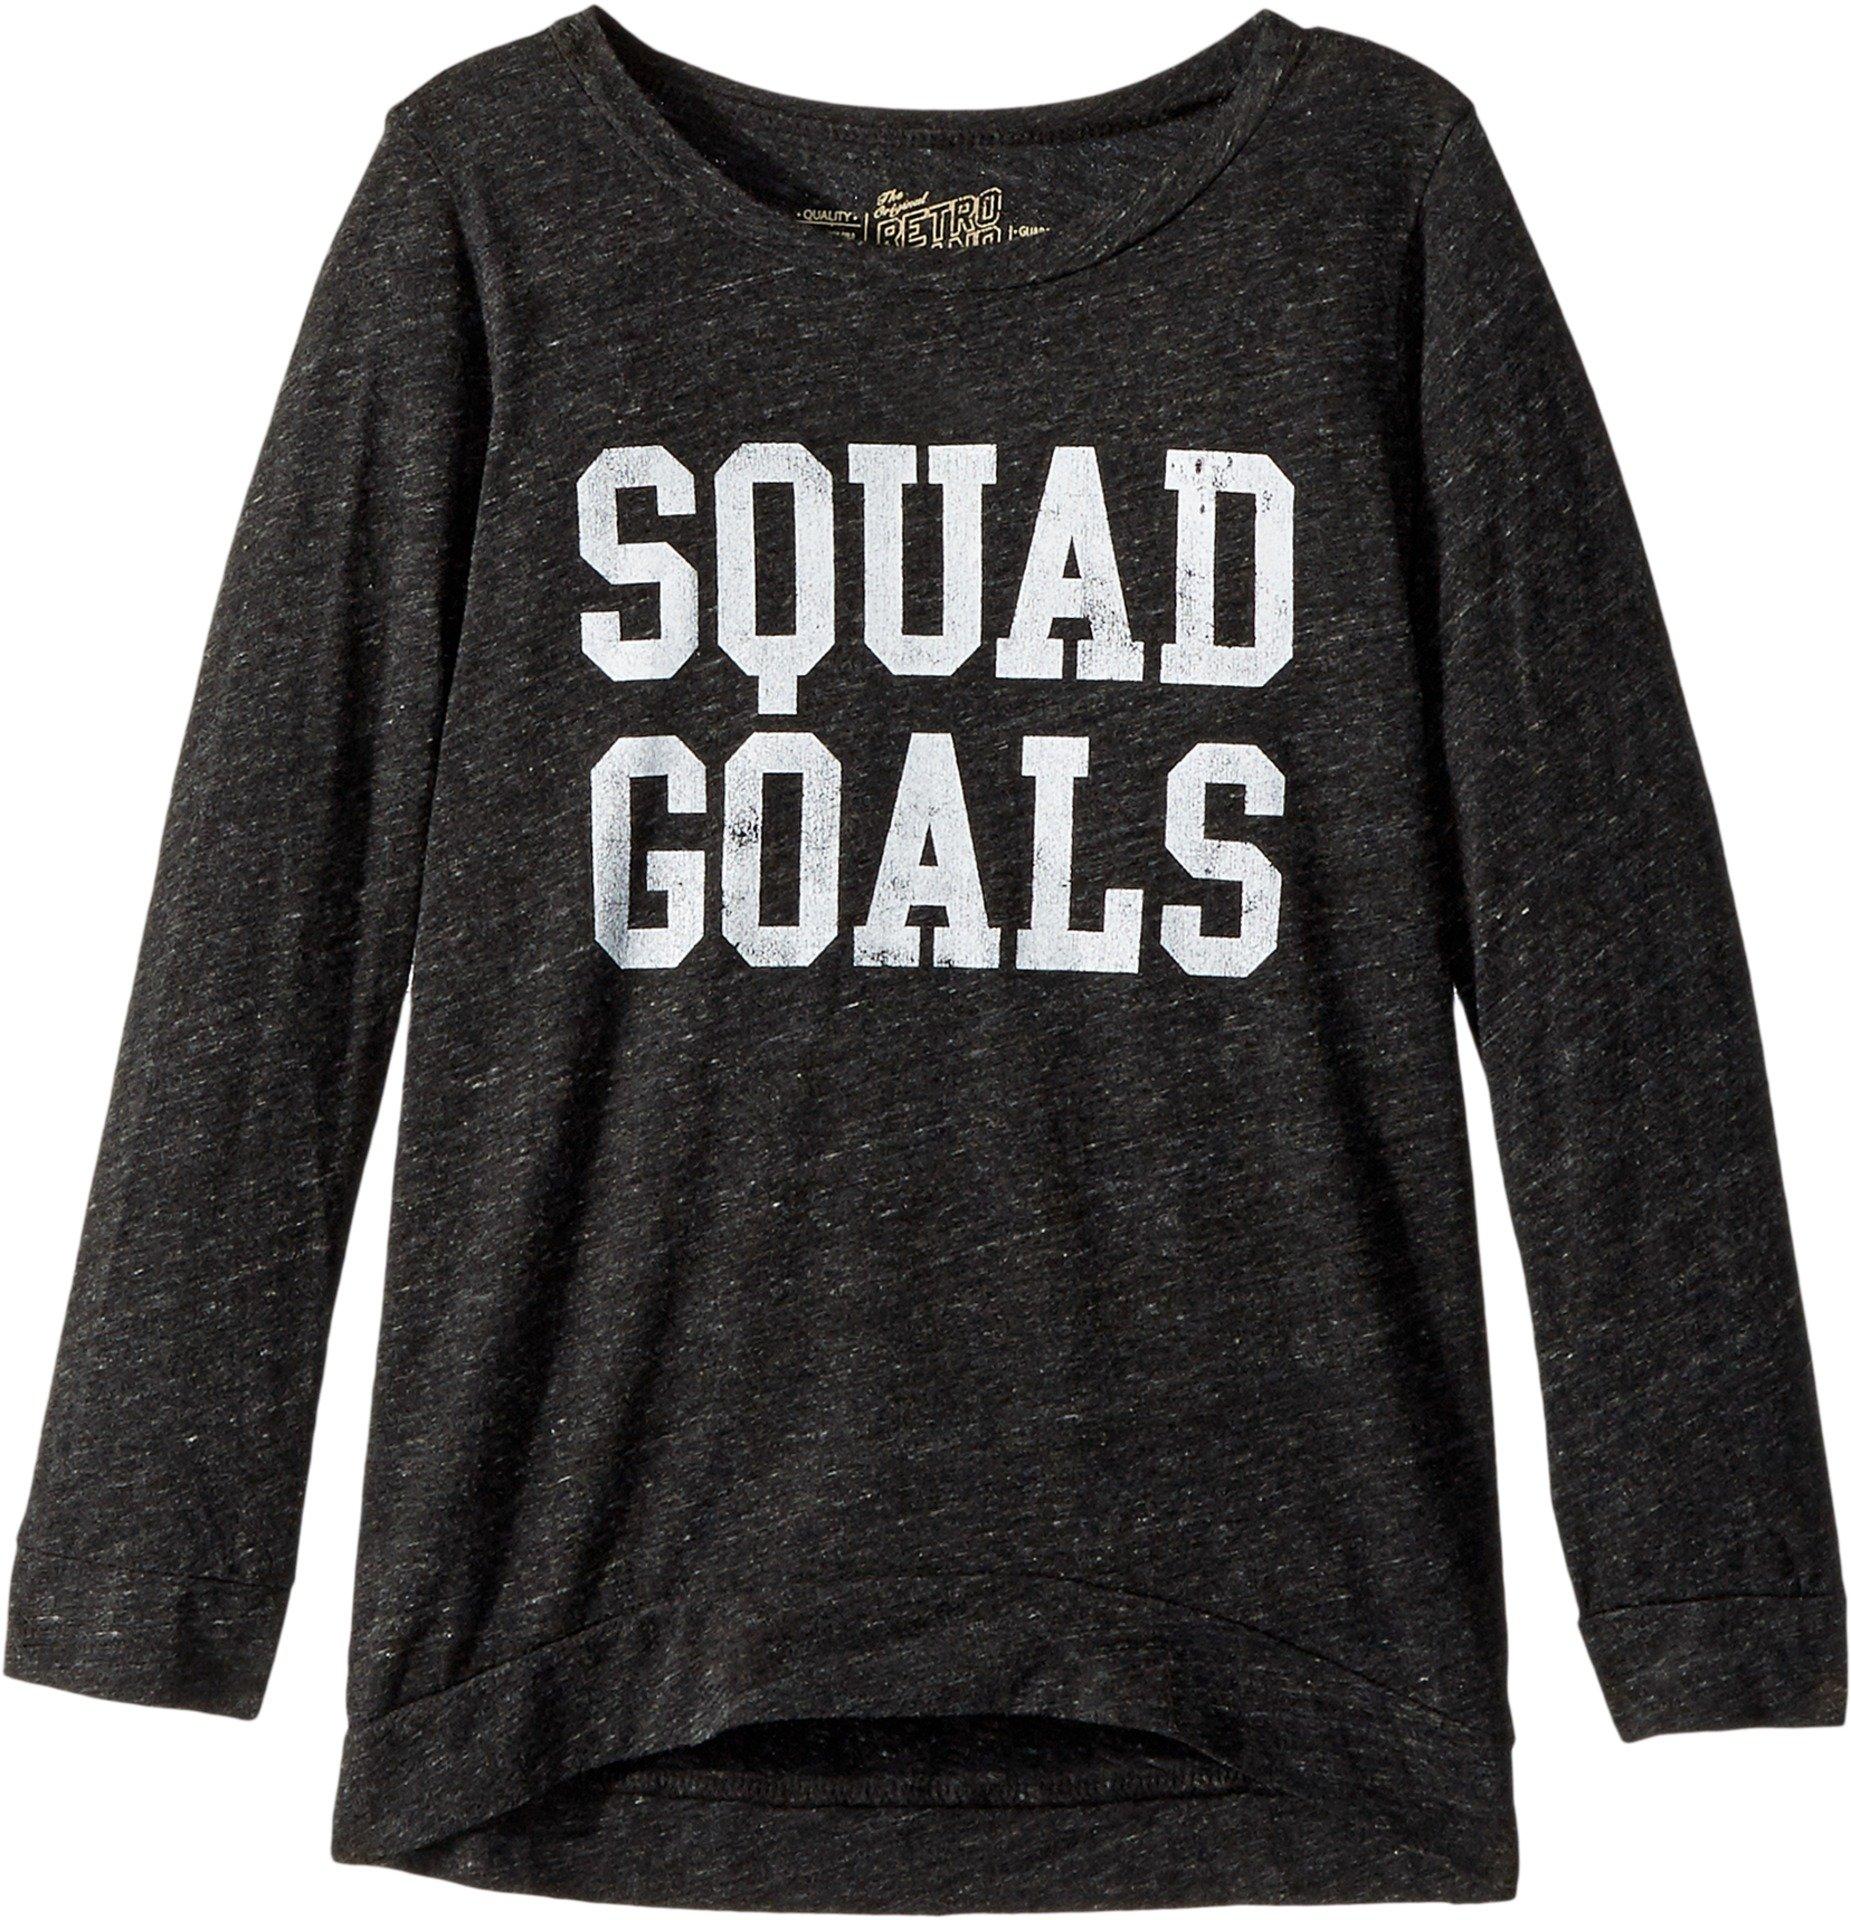 The Original Retro Brand Kids Girl's Squad Goals 3/4 Pullover (Big Kids) Streaky Black Medium by The Original Retro Brand Kids (Image #1)